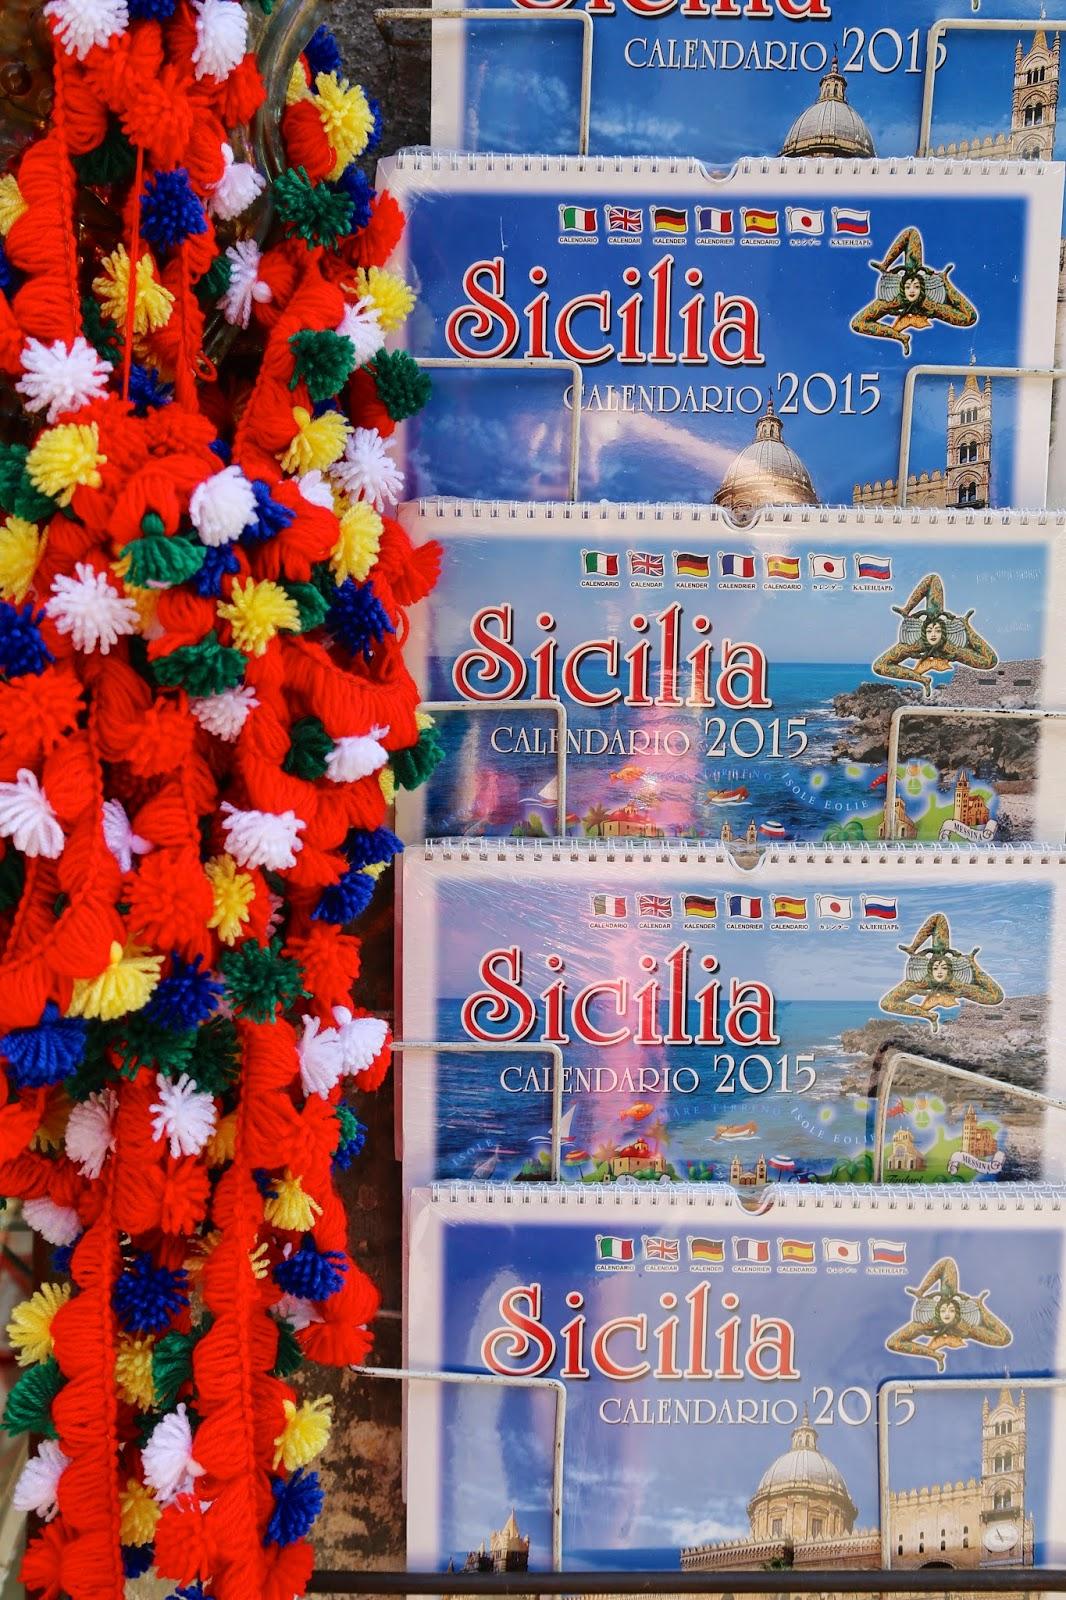 Sicilian calender, Palermo, Sicily